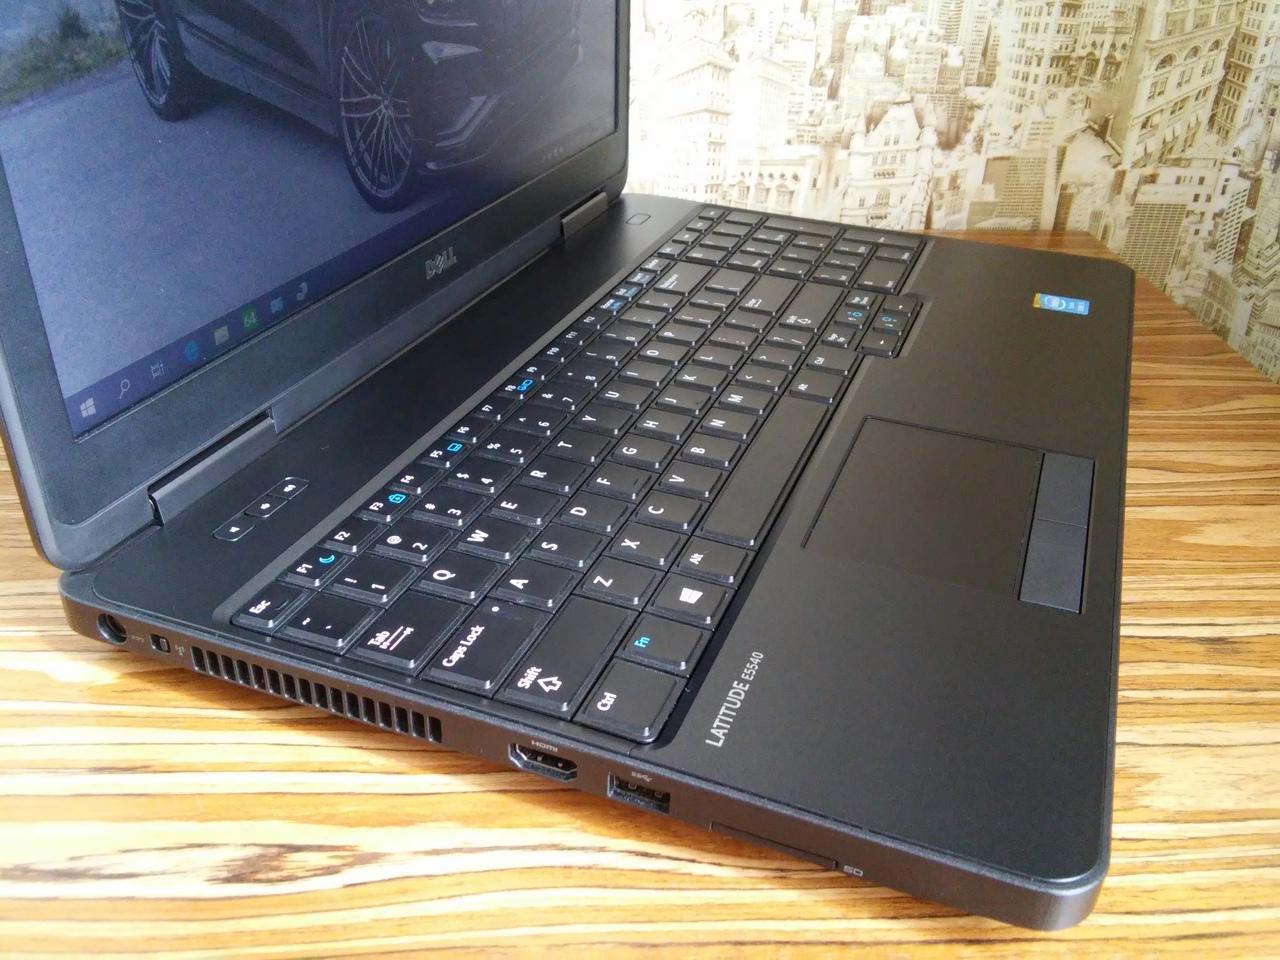 "Ноутбук DELL Latitude E5540 15,6""HD/ i3-4030u/ 4Gb DDR3/ SSD 128Gb/ АКБ 4 часа"